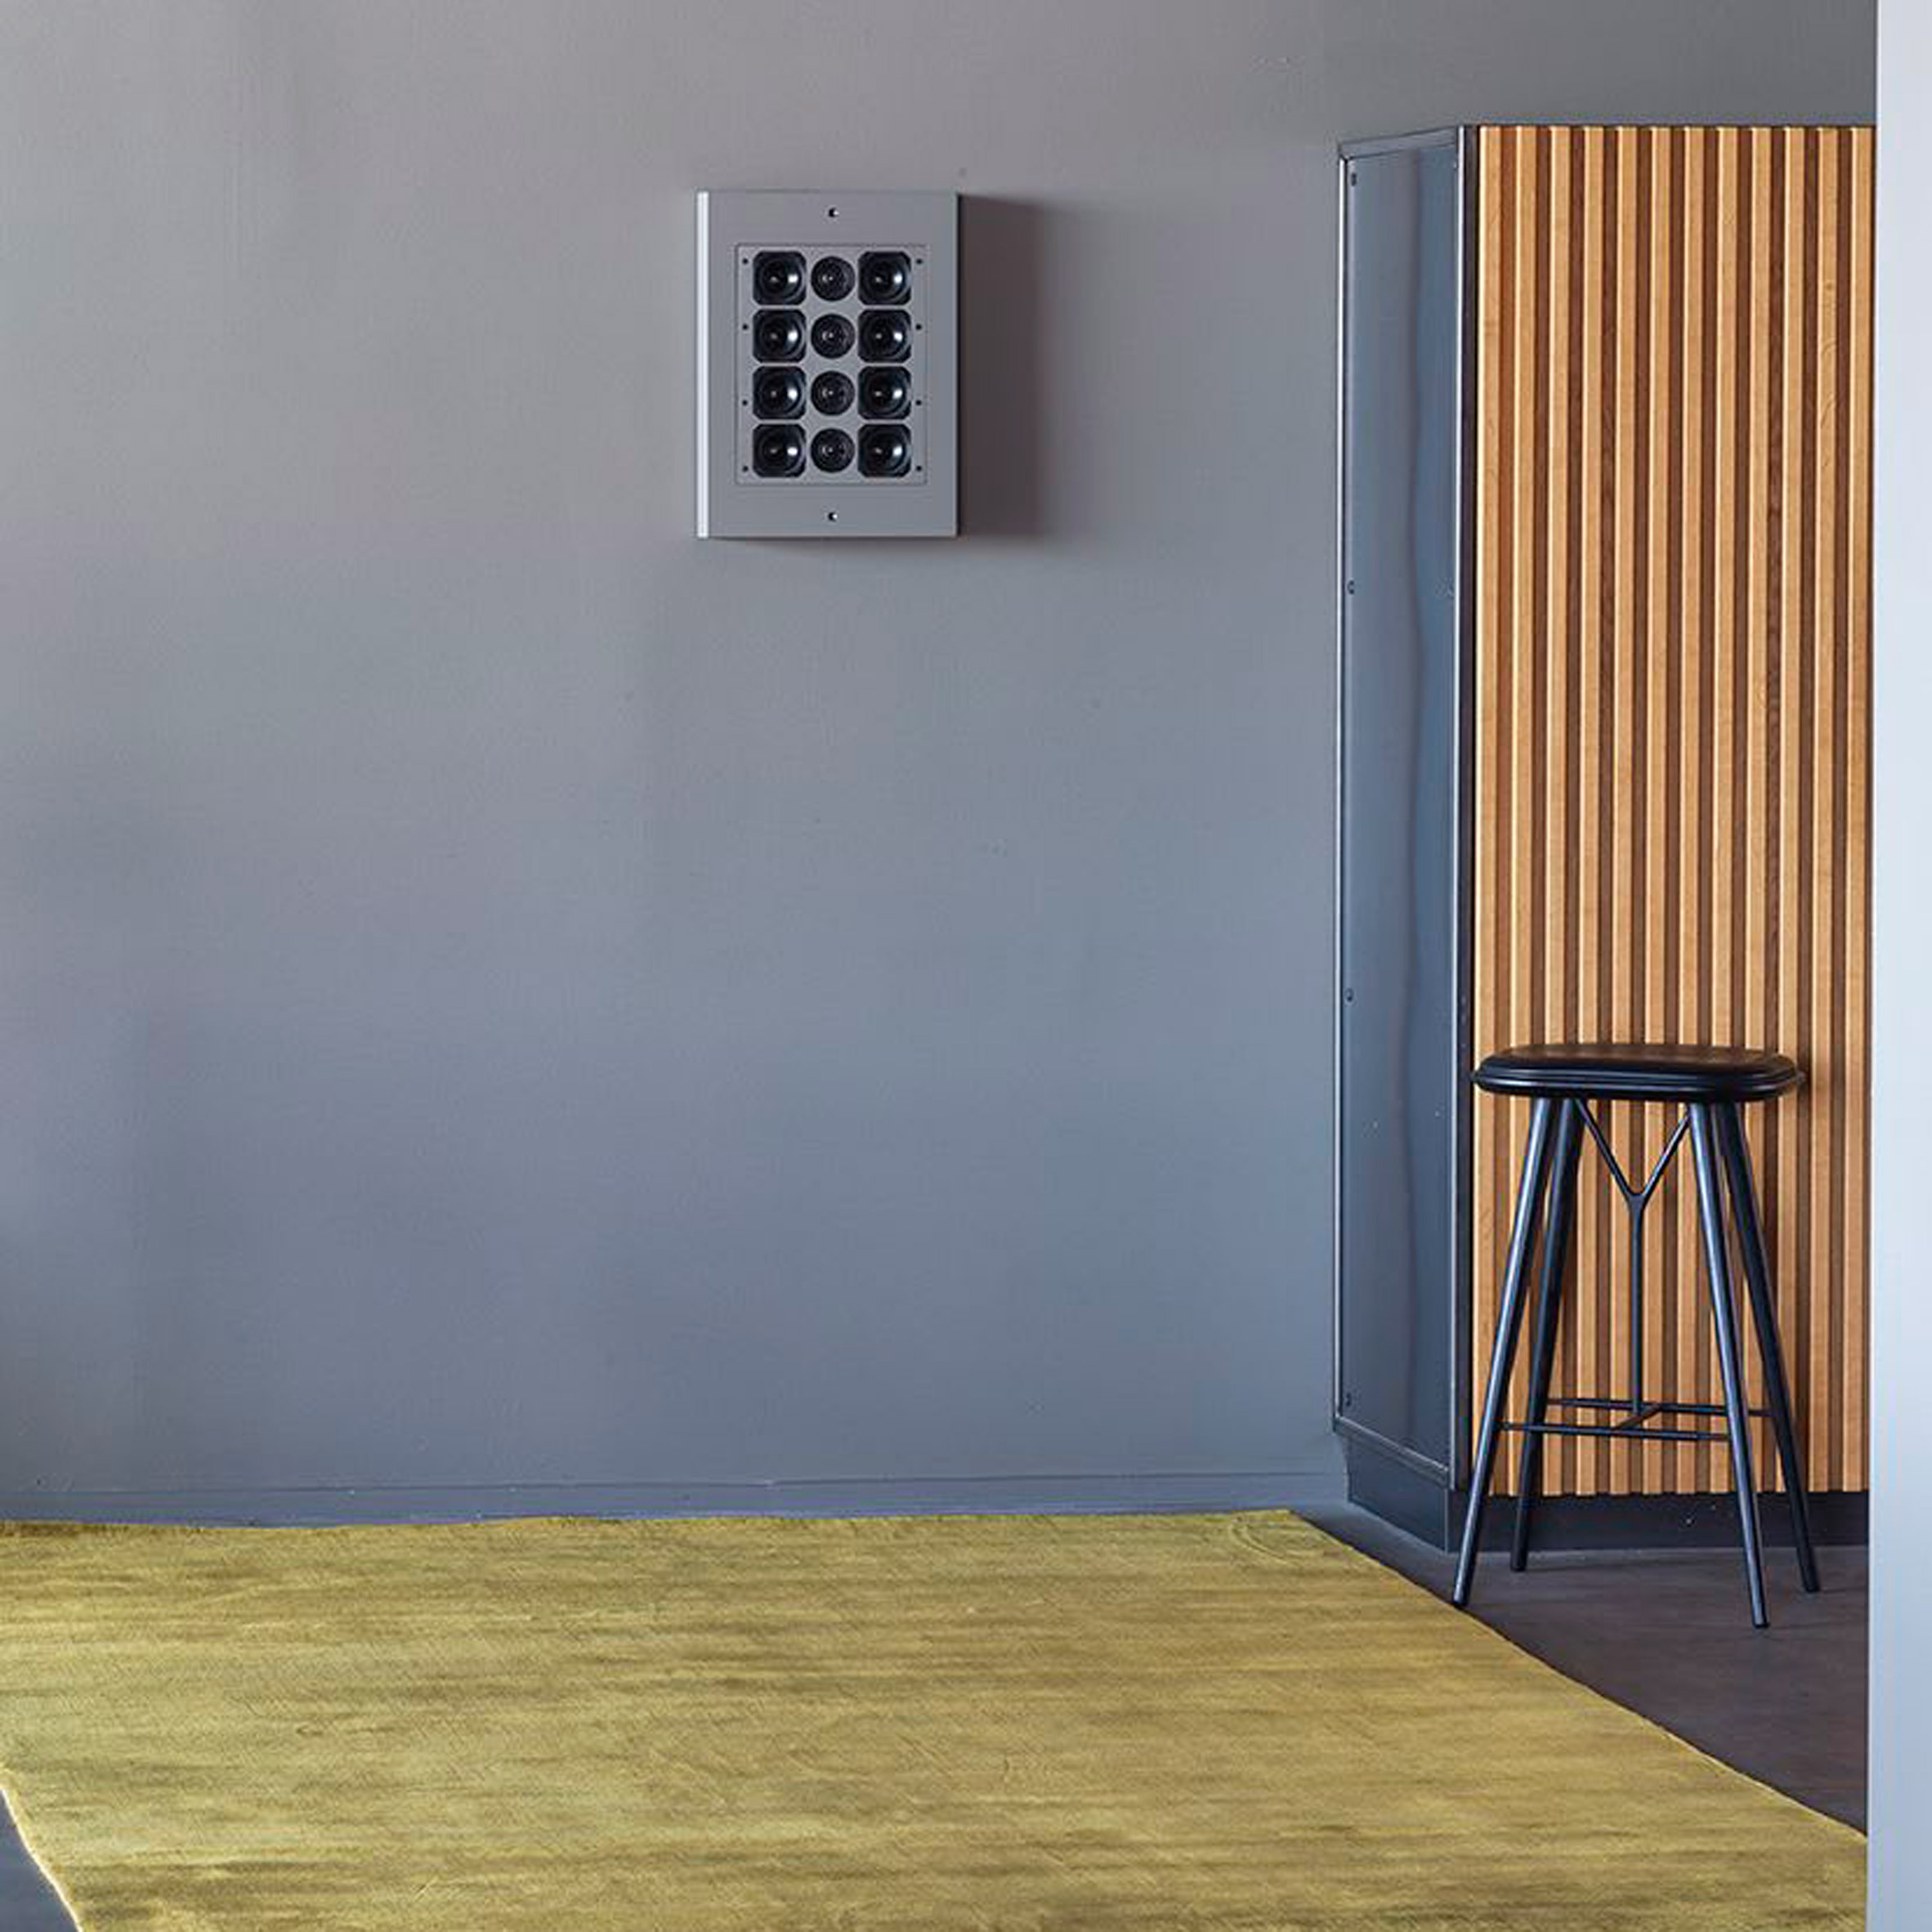 Earth Bamboo Chinese Yellow rugs by Massimo Copenhagen